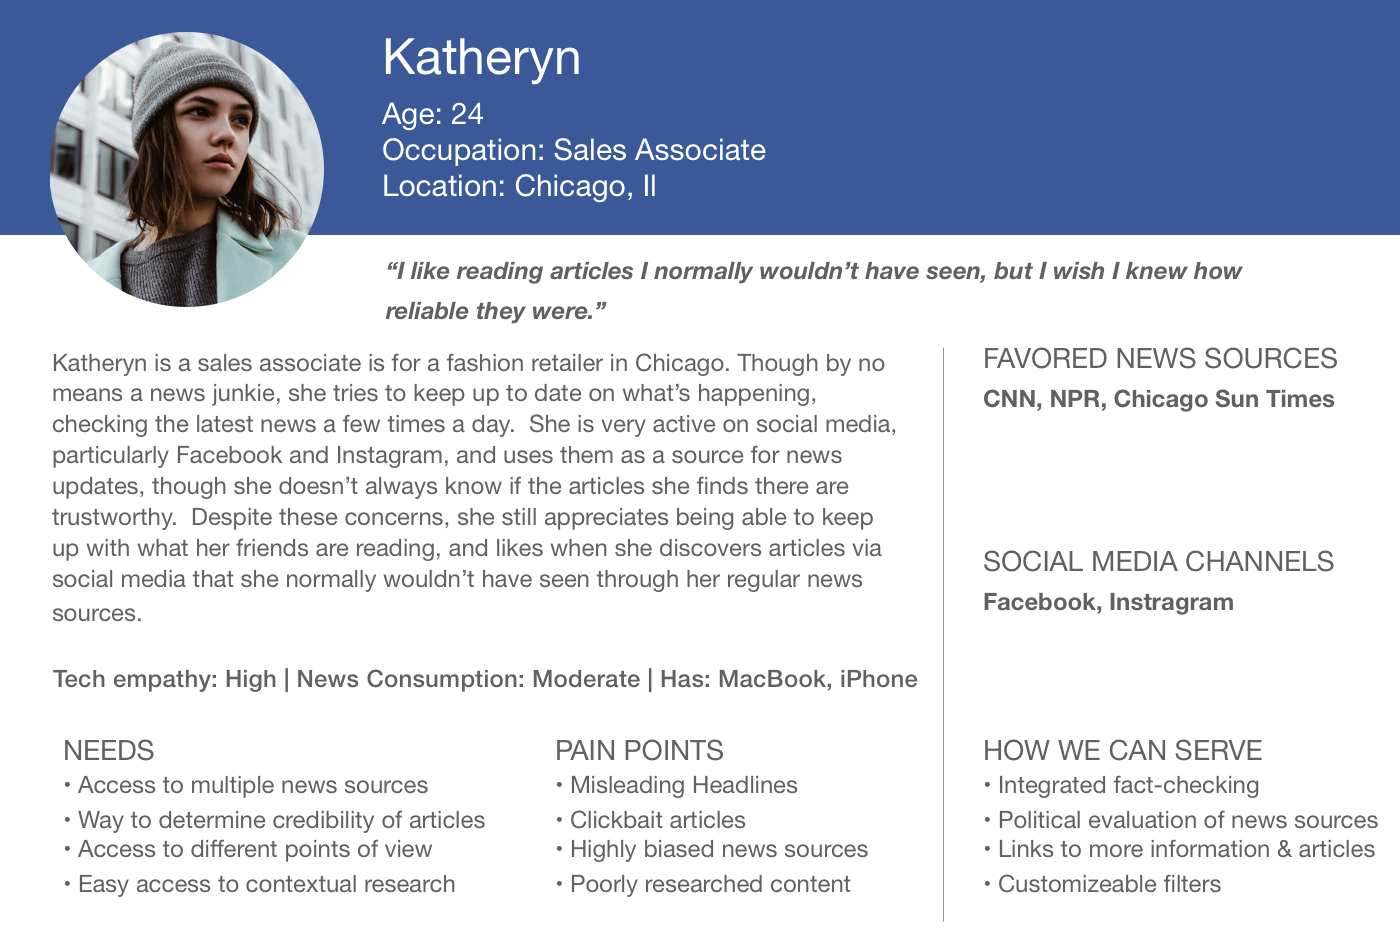 Primary Persona: Katheryn